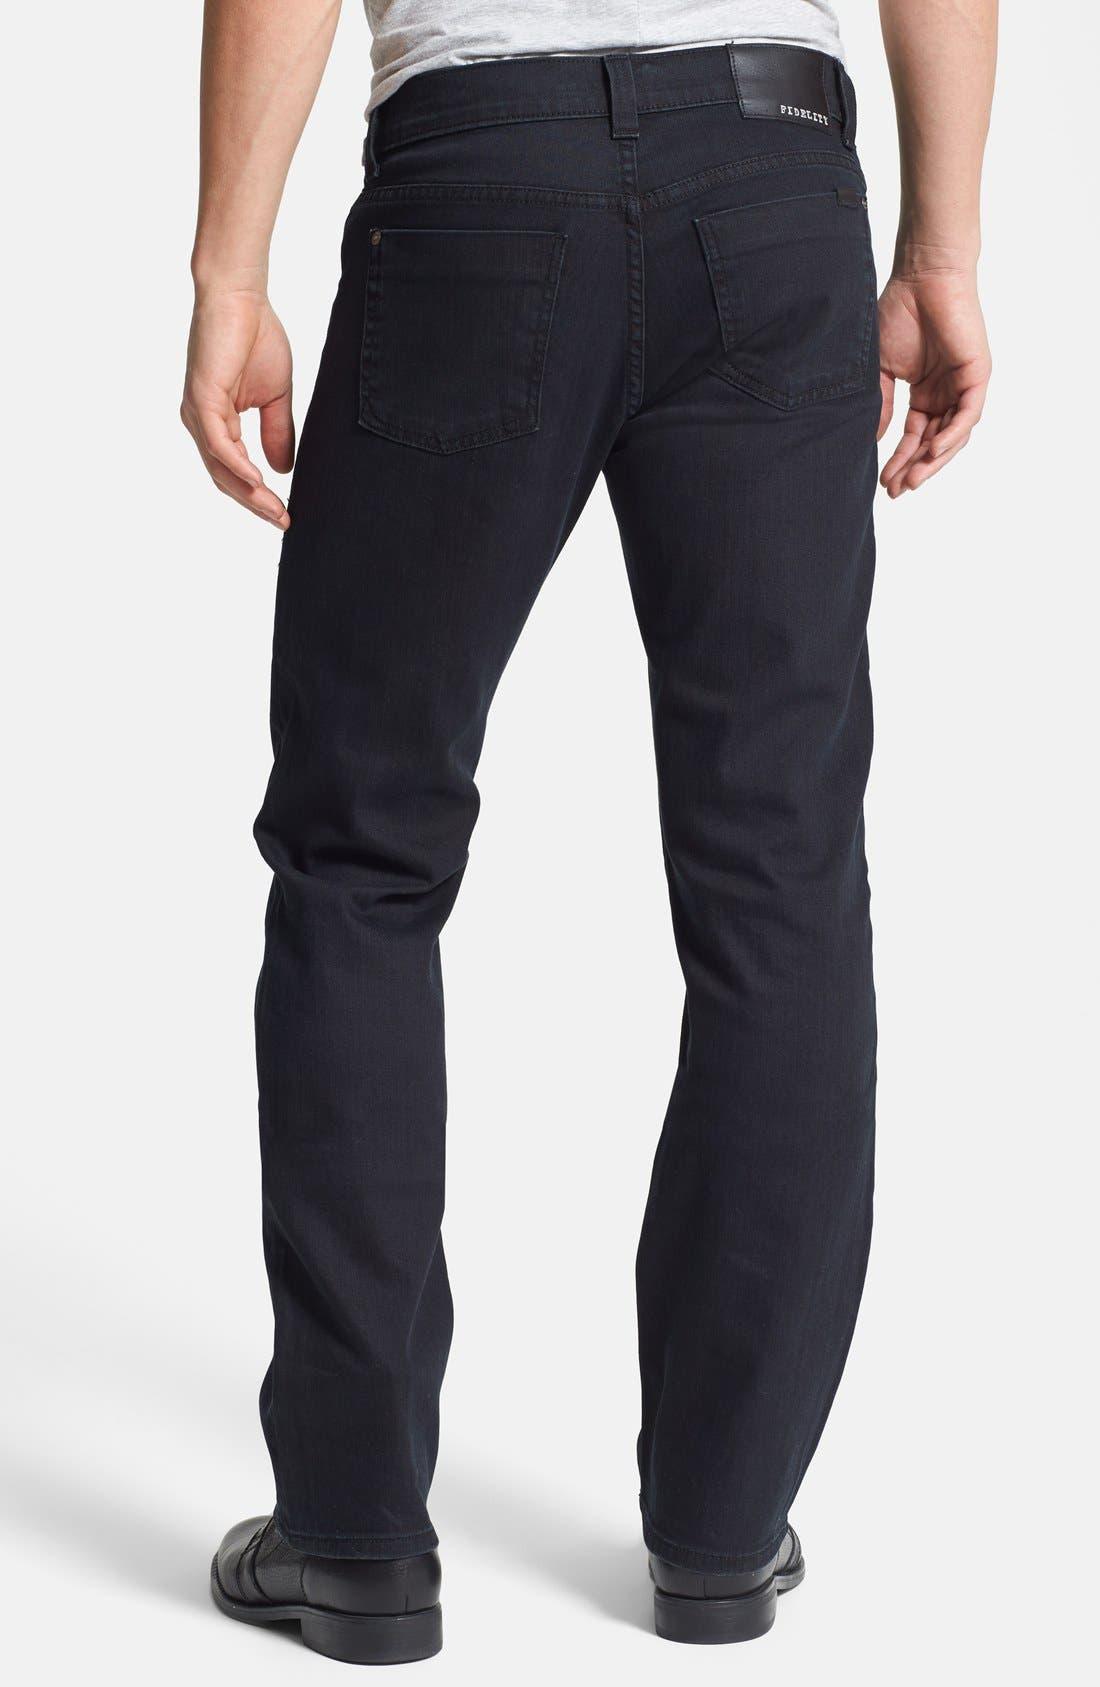 Alternate Image 2  - Fidelity Denim '50-11' Straight Leg Jeans (Town Black Vintage)